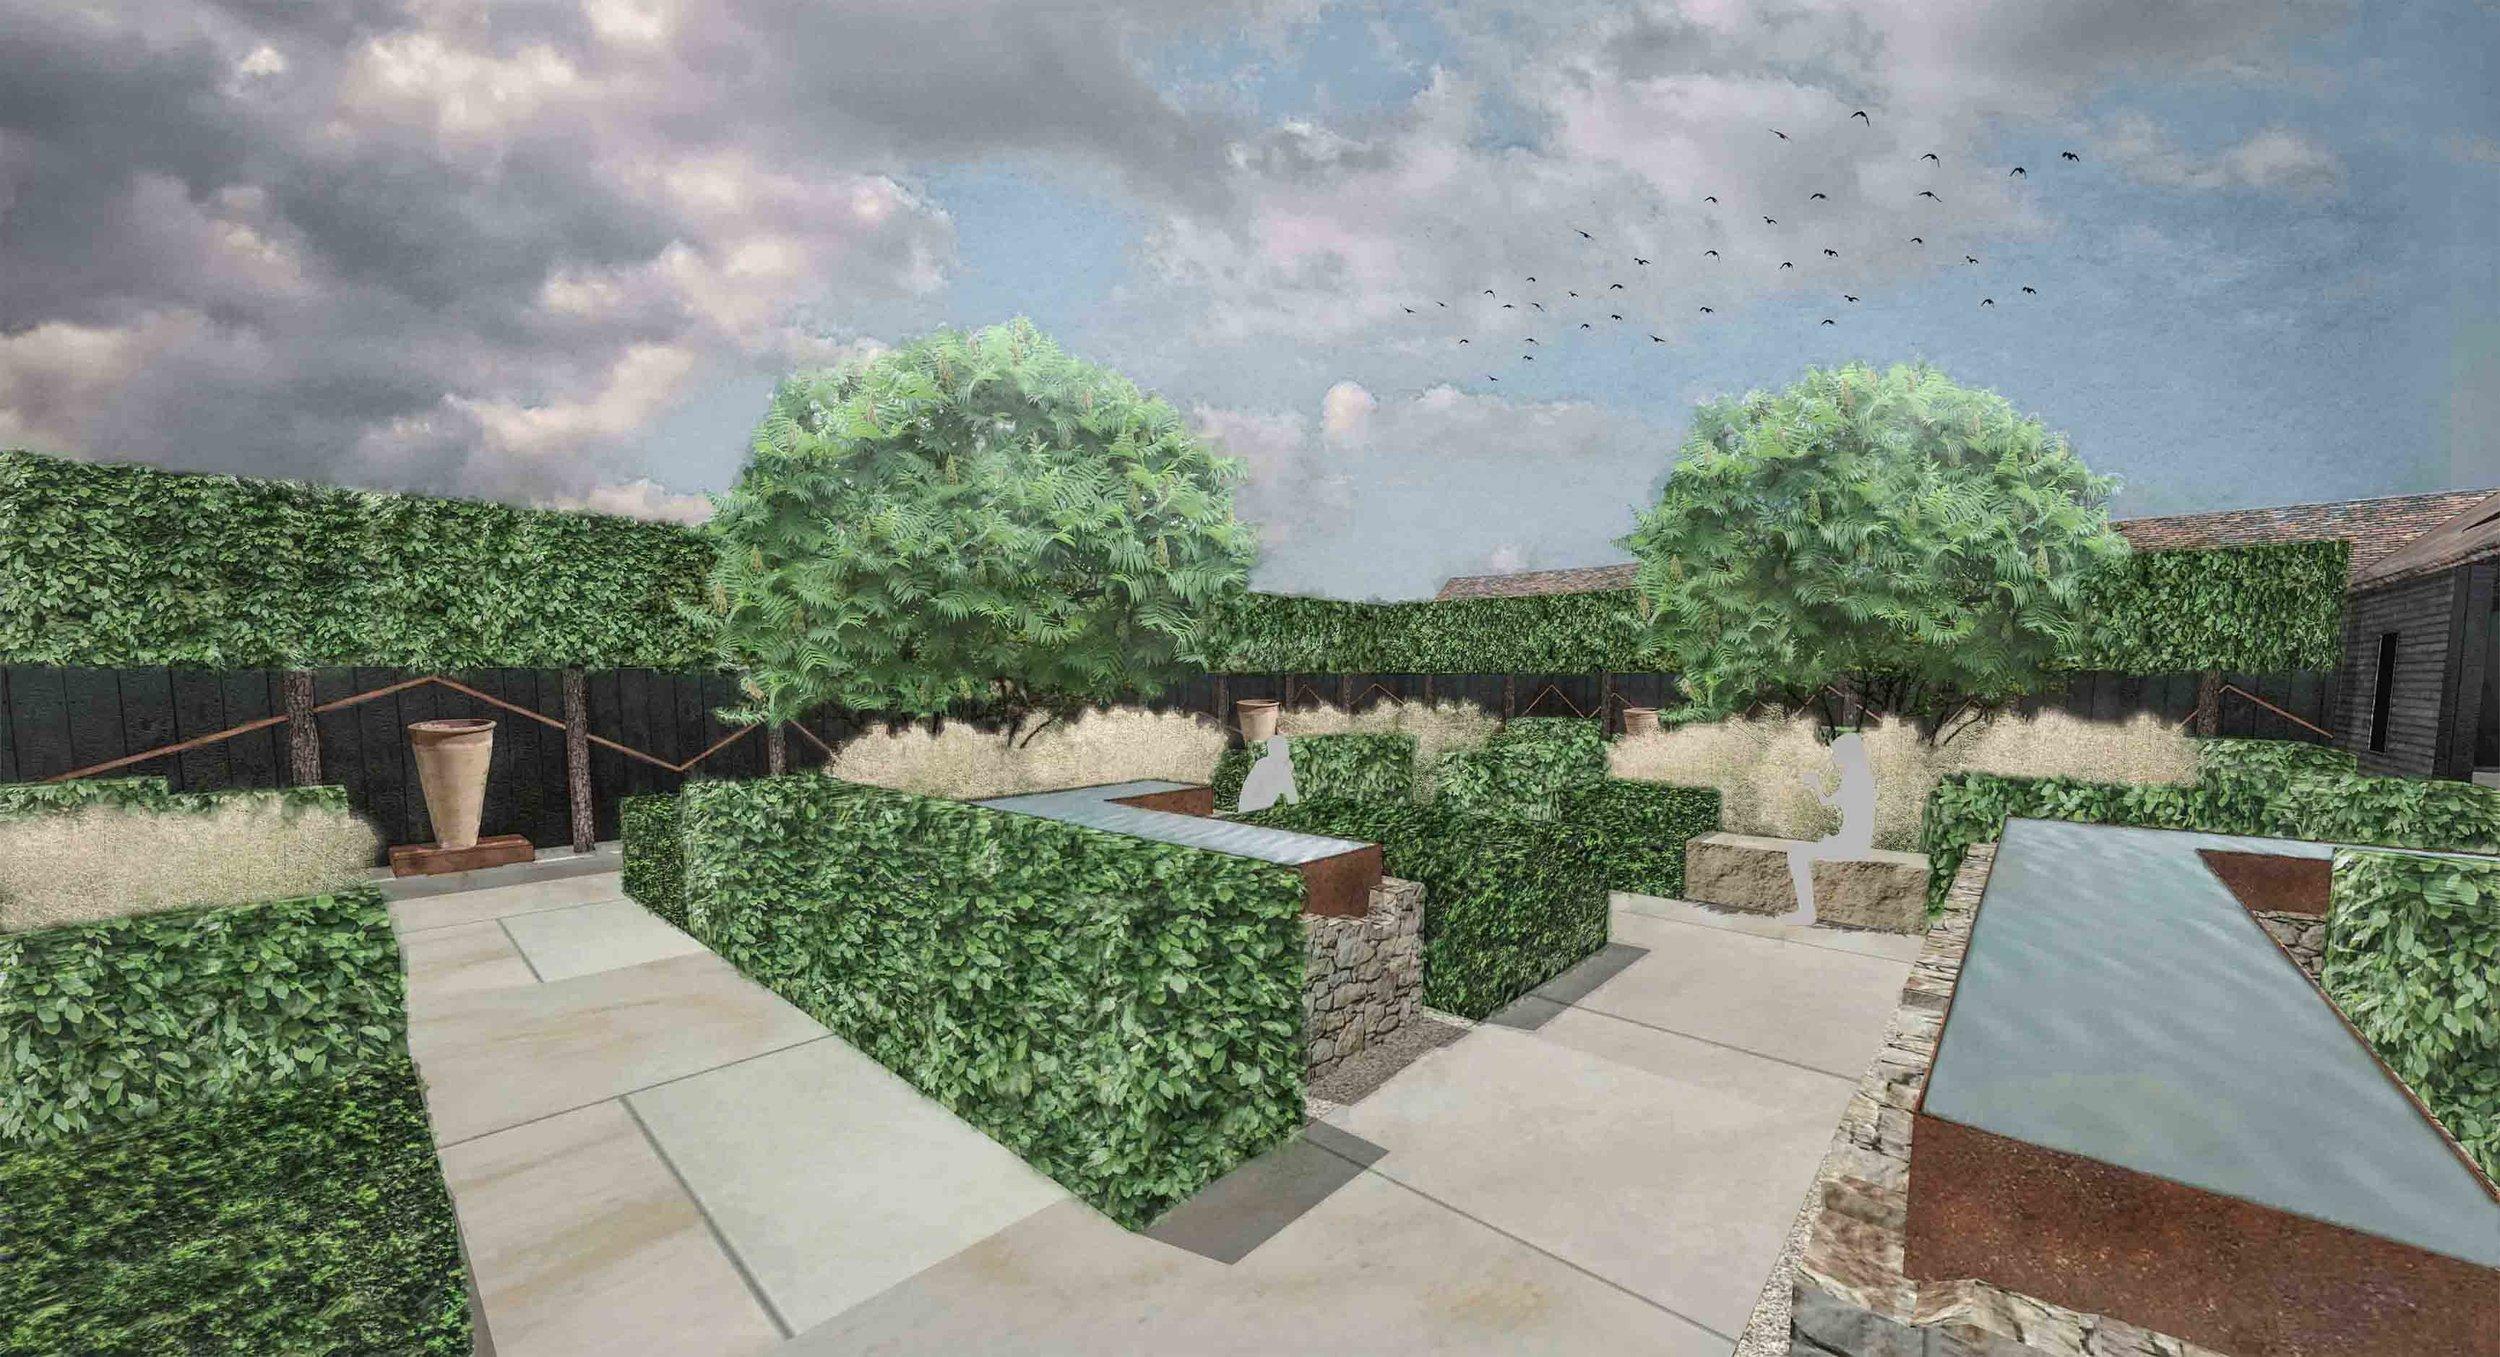 sandstone corten water features pleached trees modern courtyard.jpg